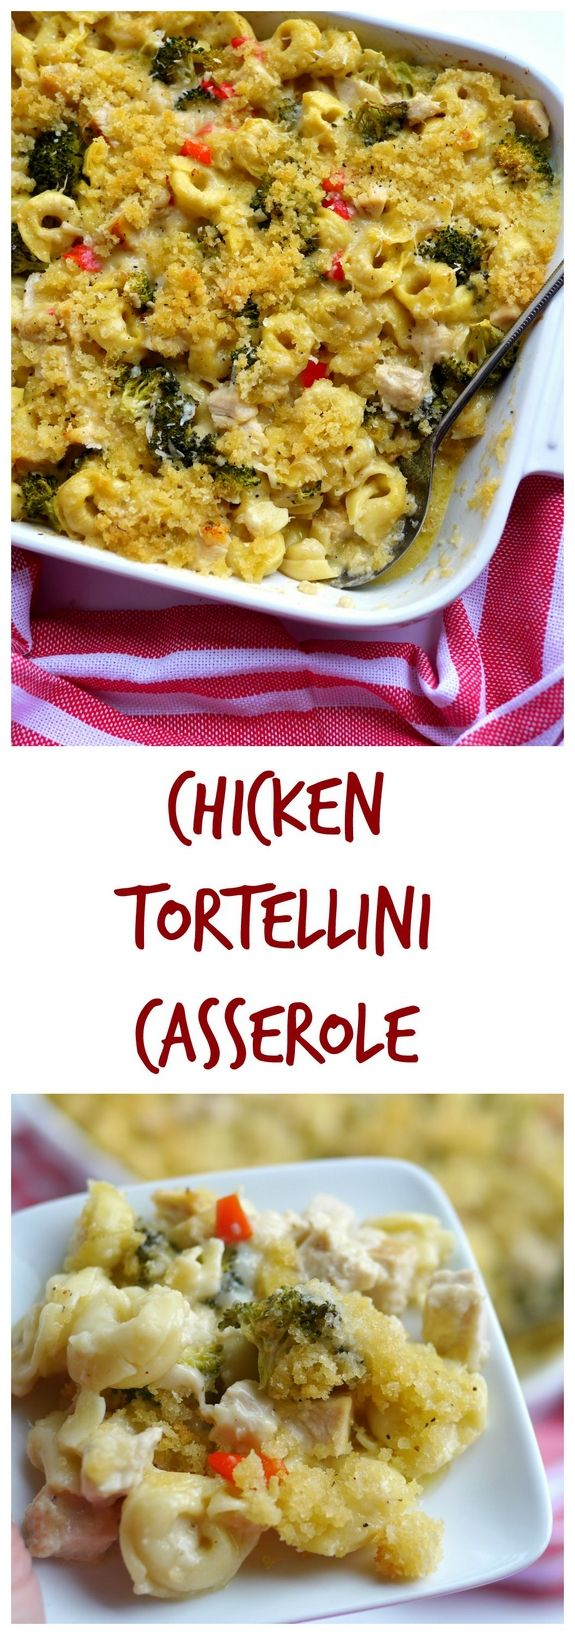 Chicken Tortellini Casserole from NoblePig.com.